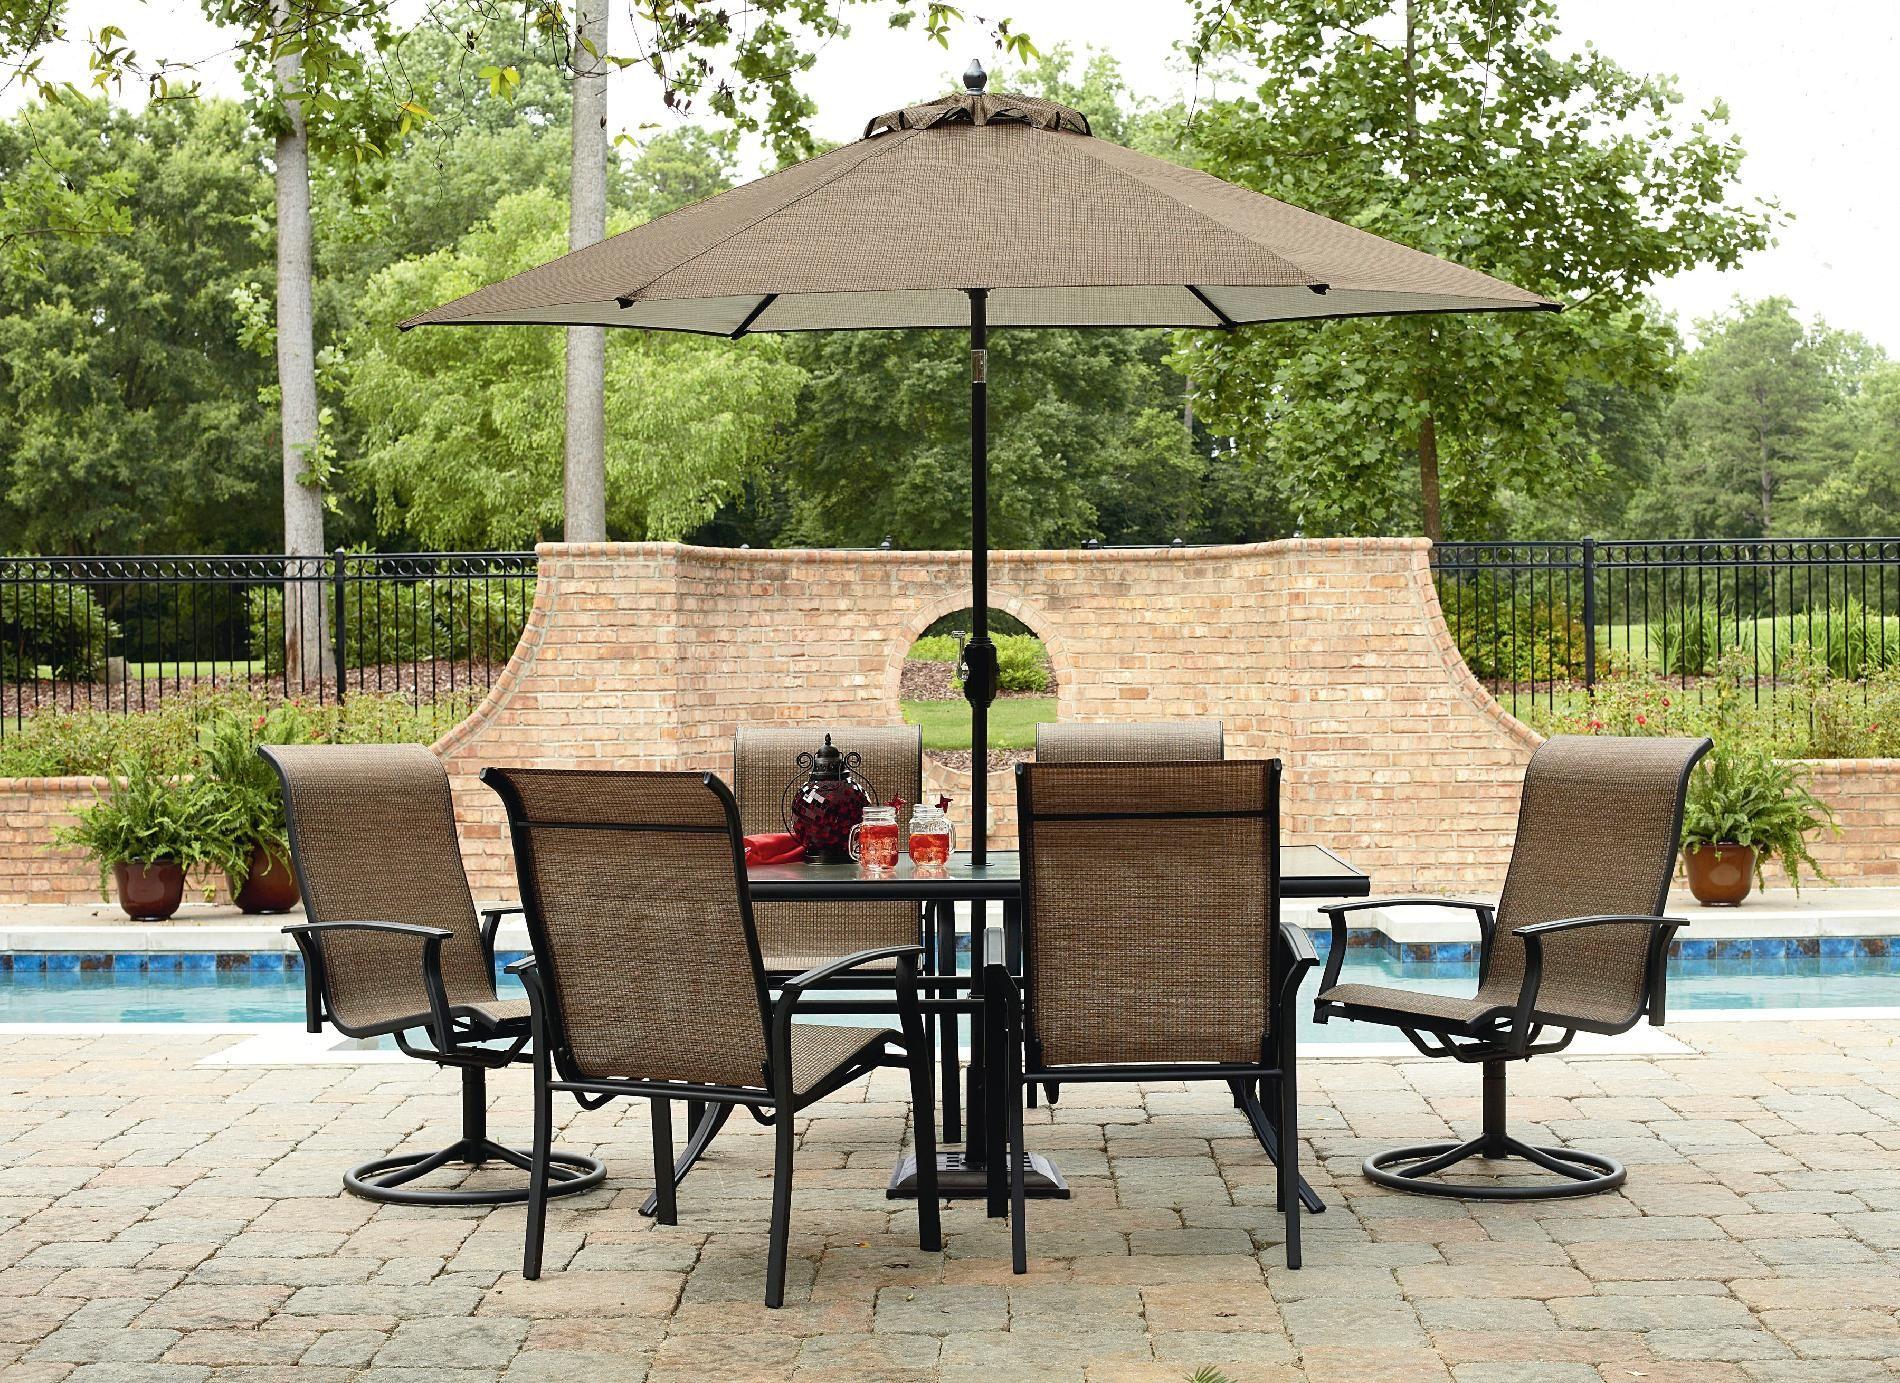 Garden Oasis Harrison 7 Piece Dining Set - Outdoor Living